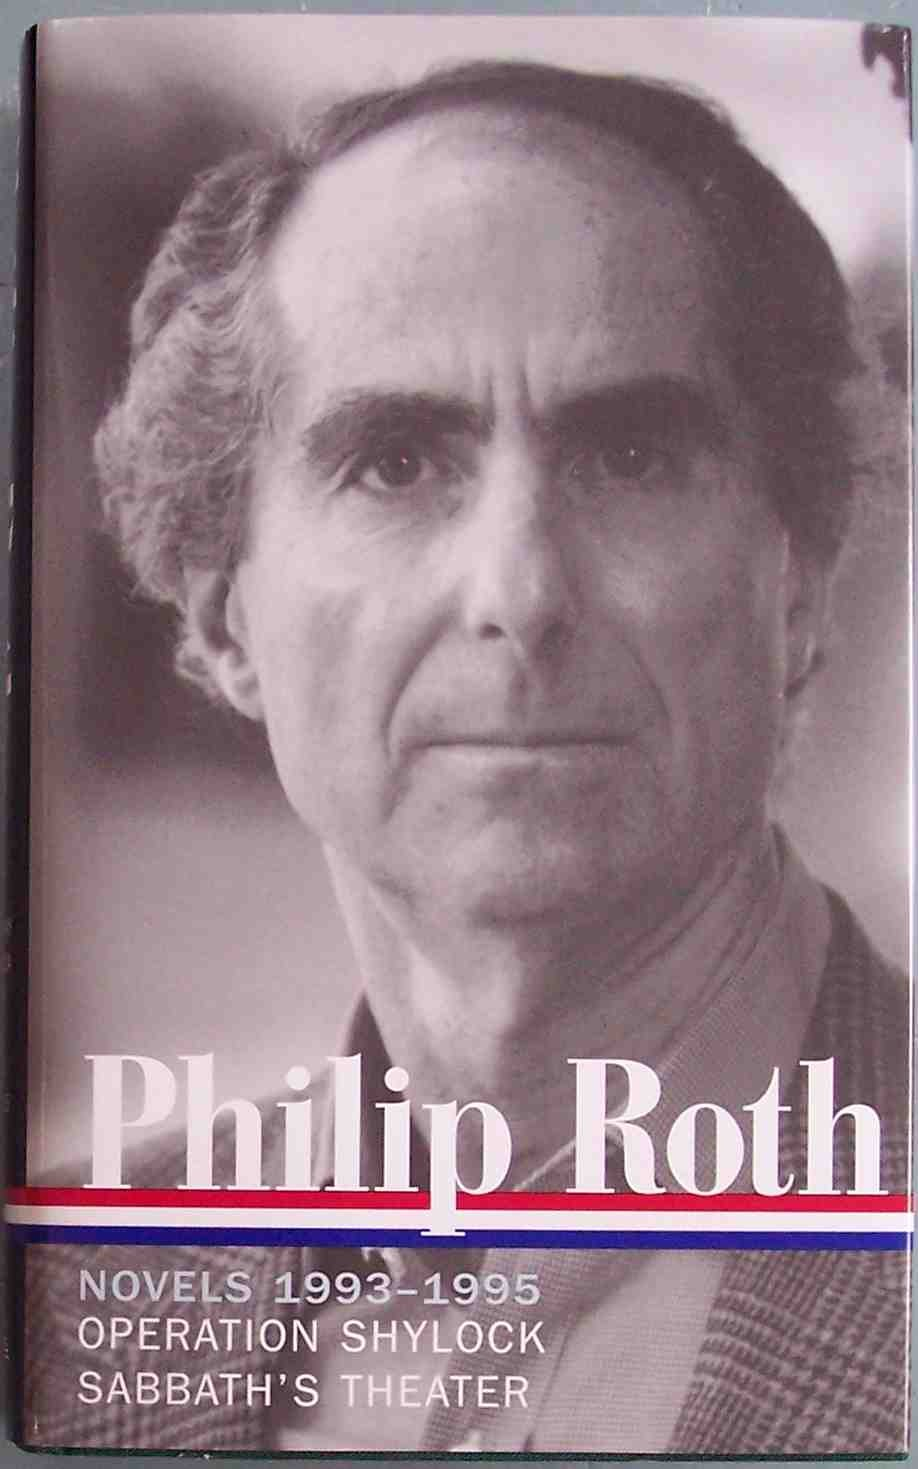 Escritor Philip Roth faleceu aos 85 anos (Foto: Flickr/CHRISTO DRUMMKOPF)